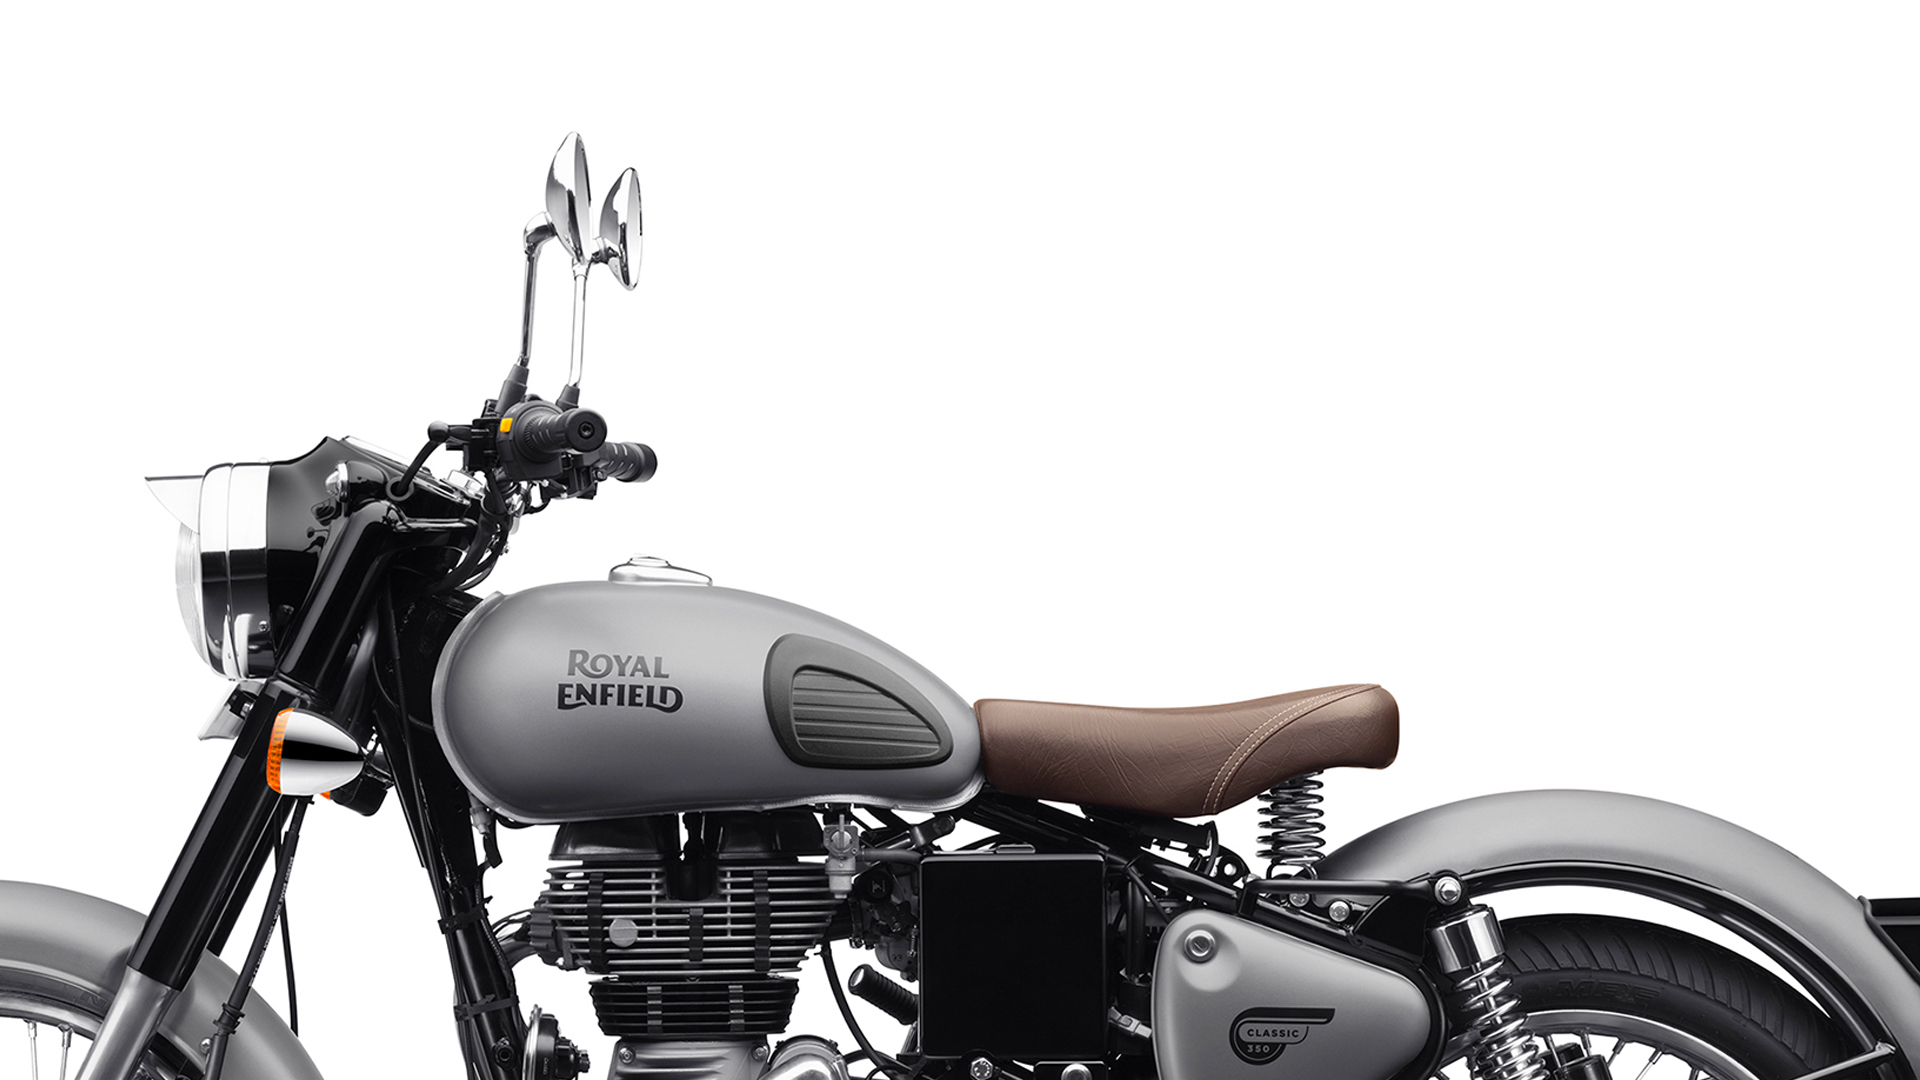 Bullet 350 Hd Wallpaper Royal Enfield Classic 350 2017 Gunmetal Grey Bike Photos